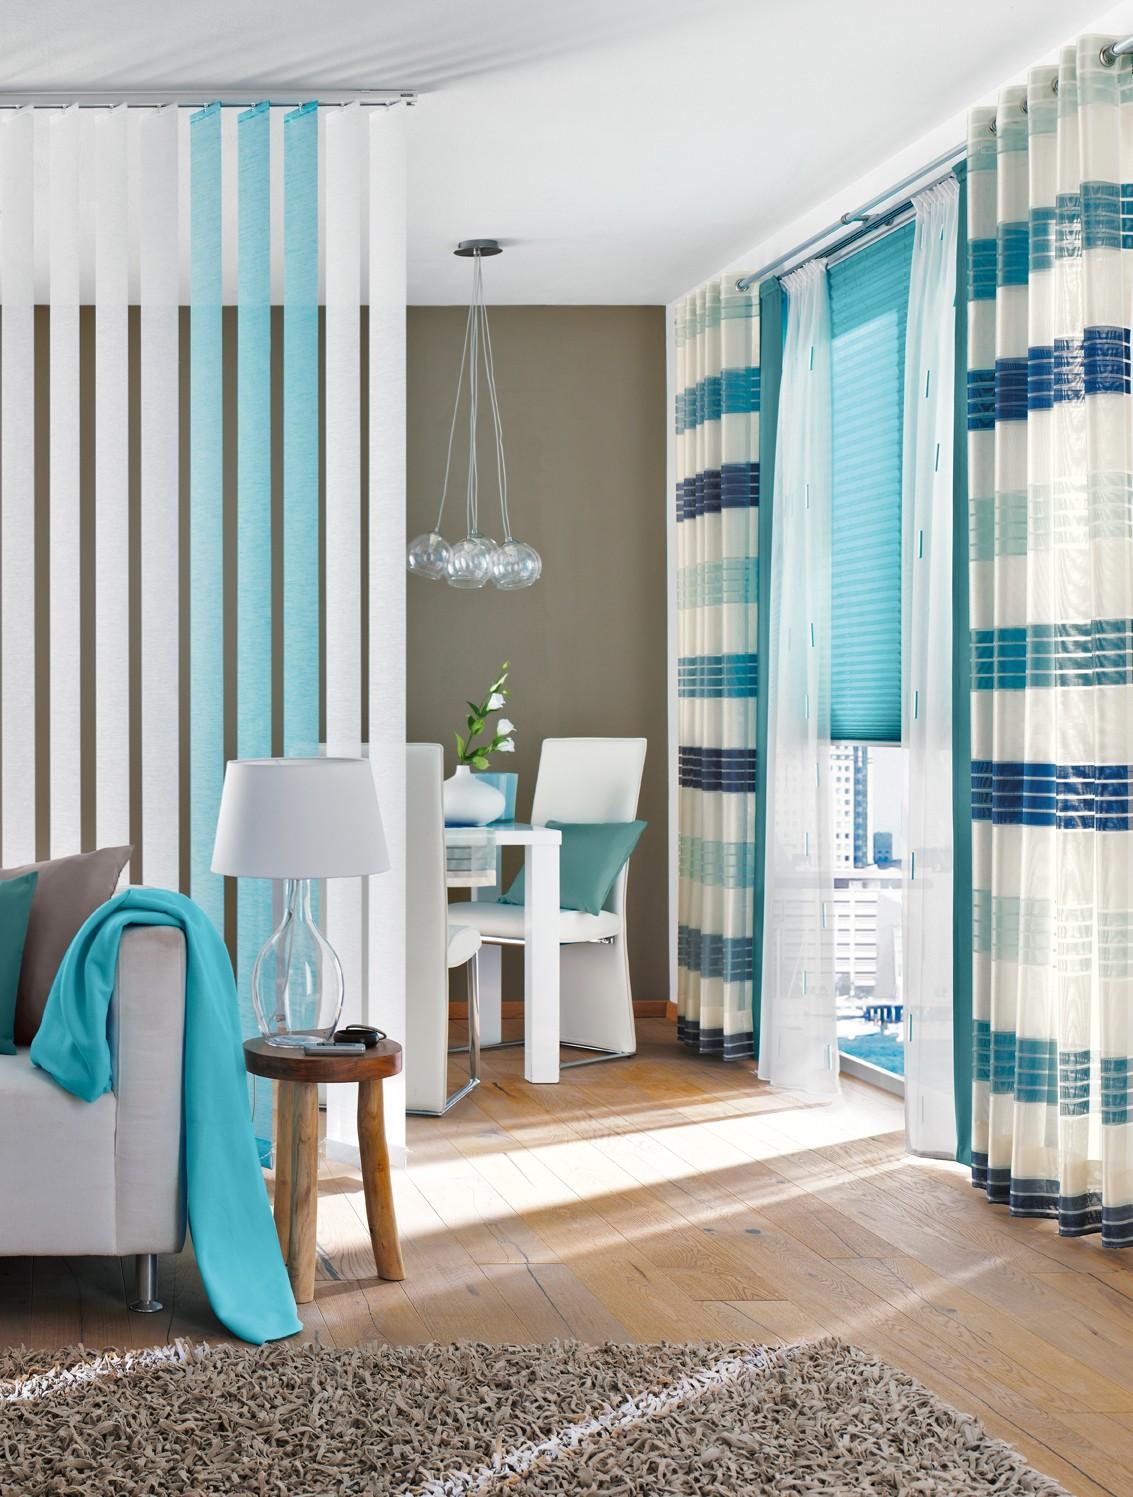 gardinen modern wohnzimmer braun – Dumss.com